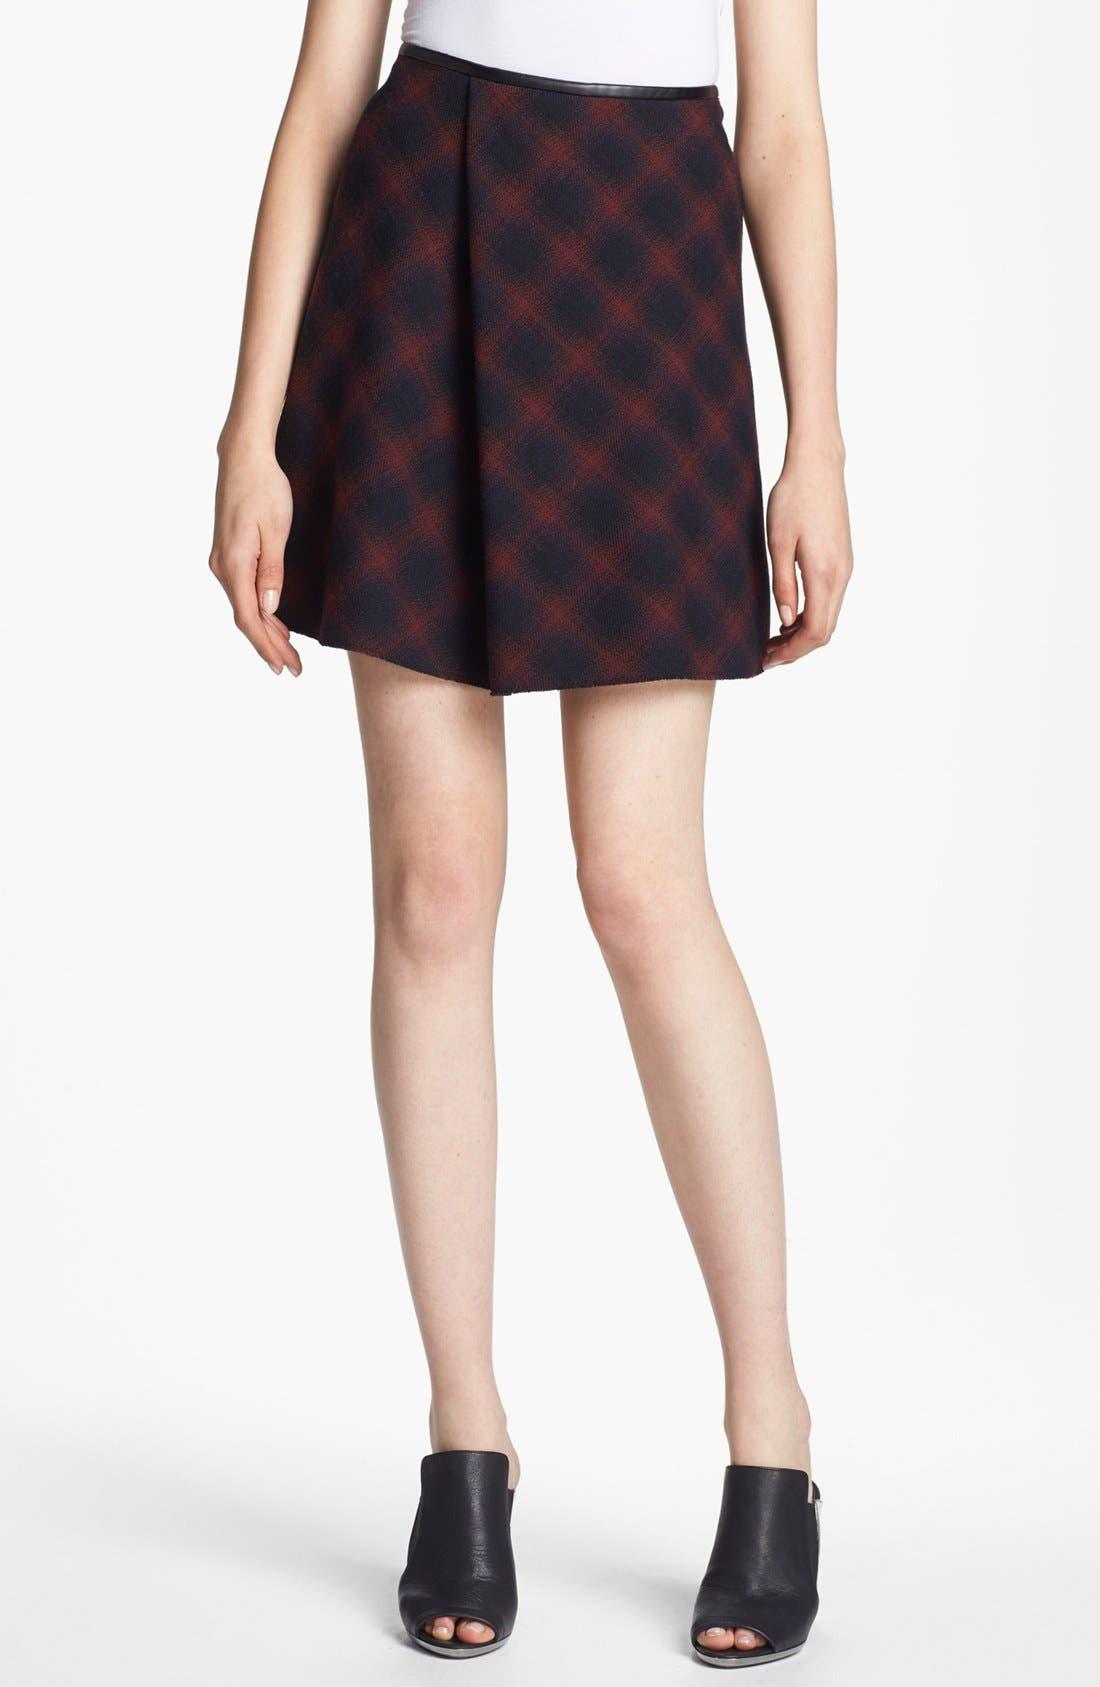 Alternate Image 1 Selected - 3.1 Phillip Lim Flared Plaid Skirt